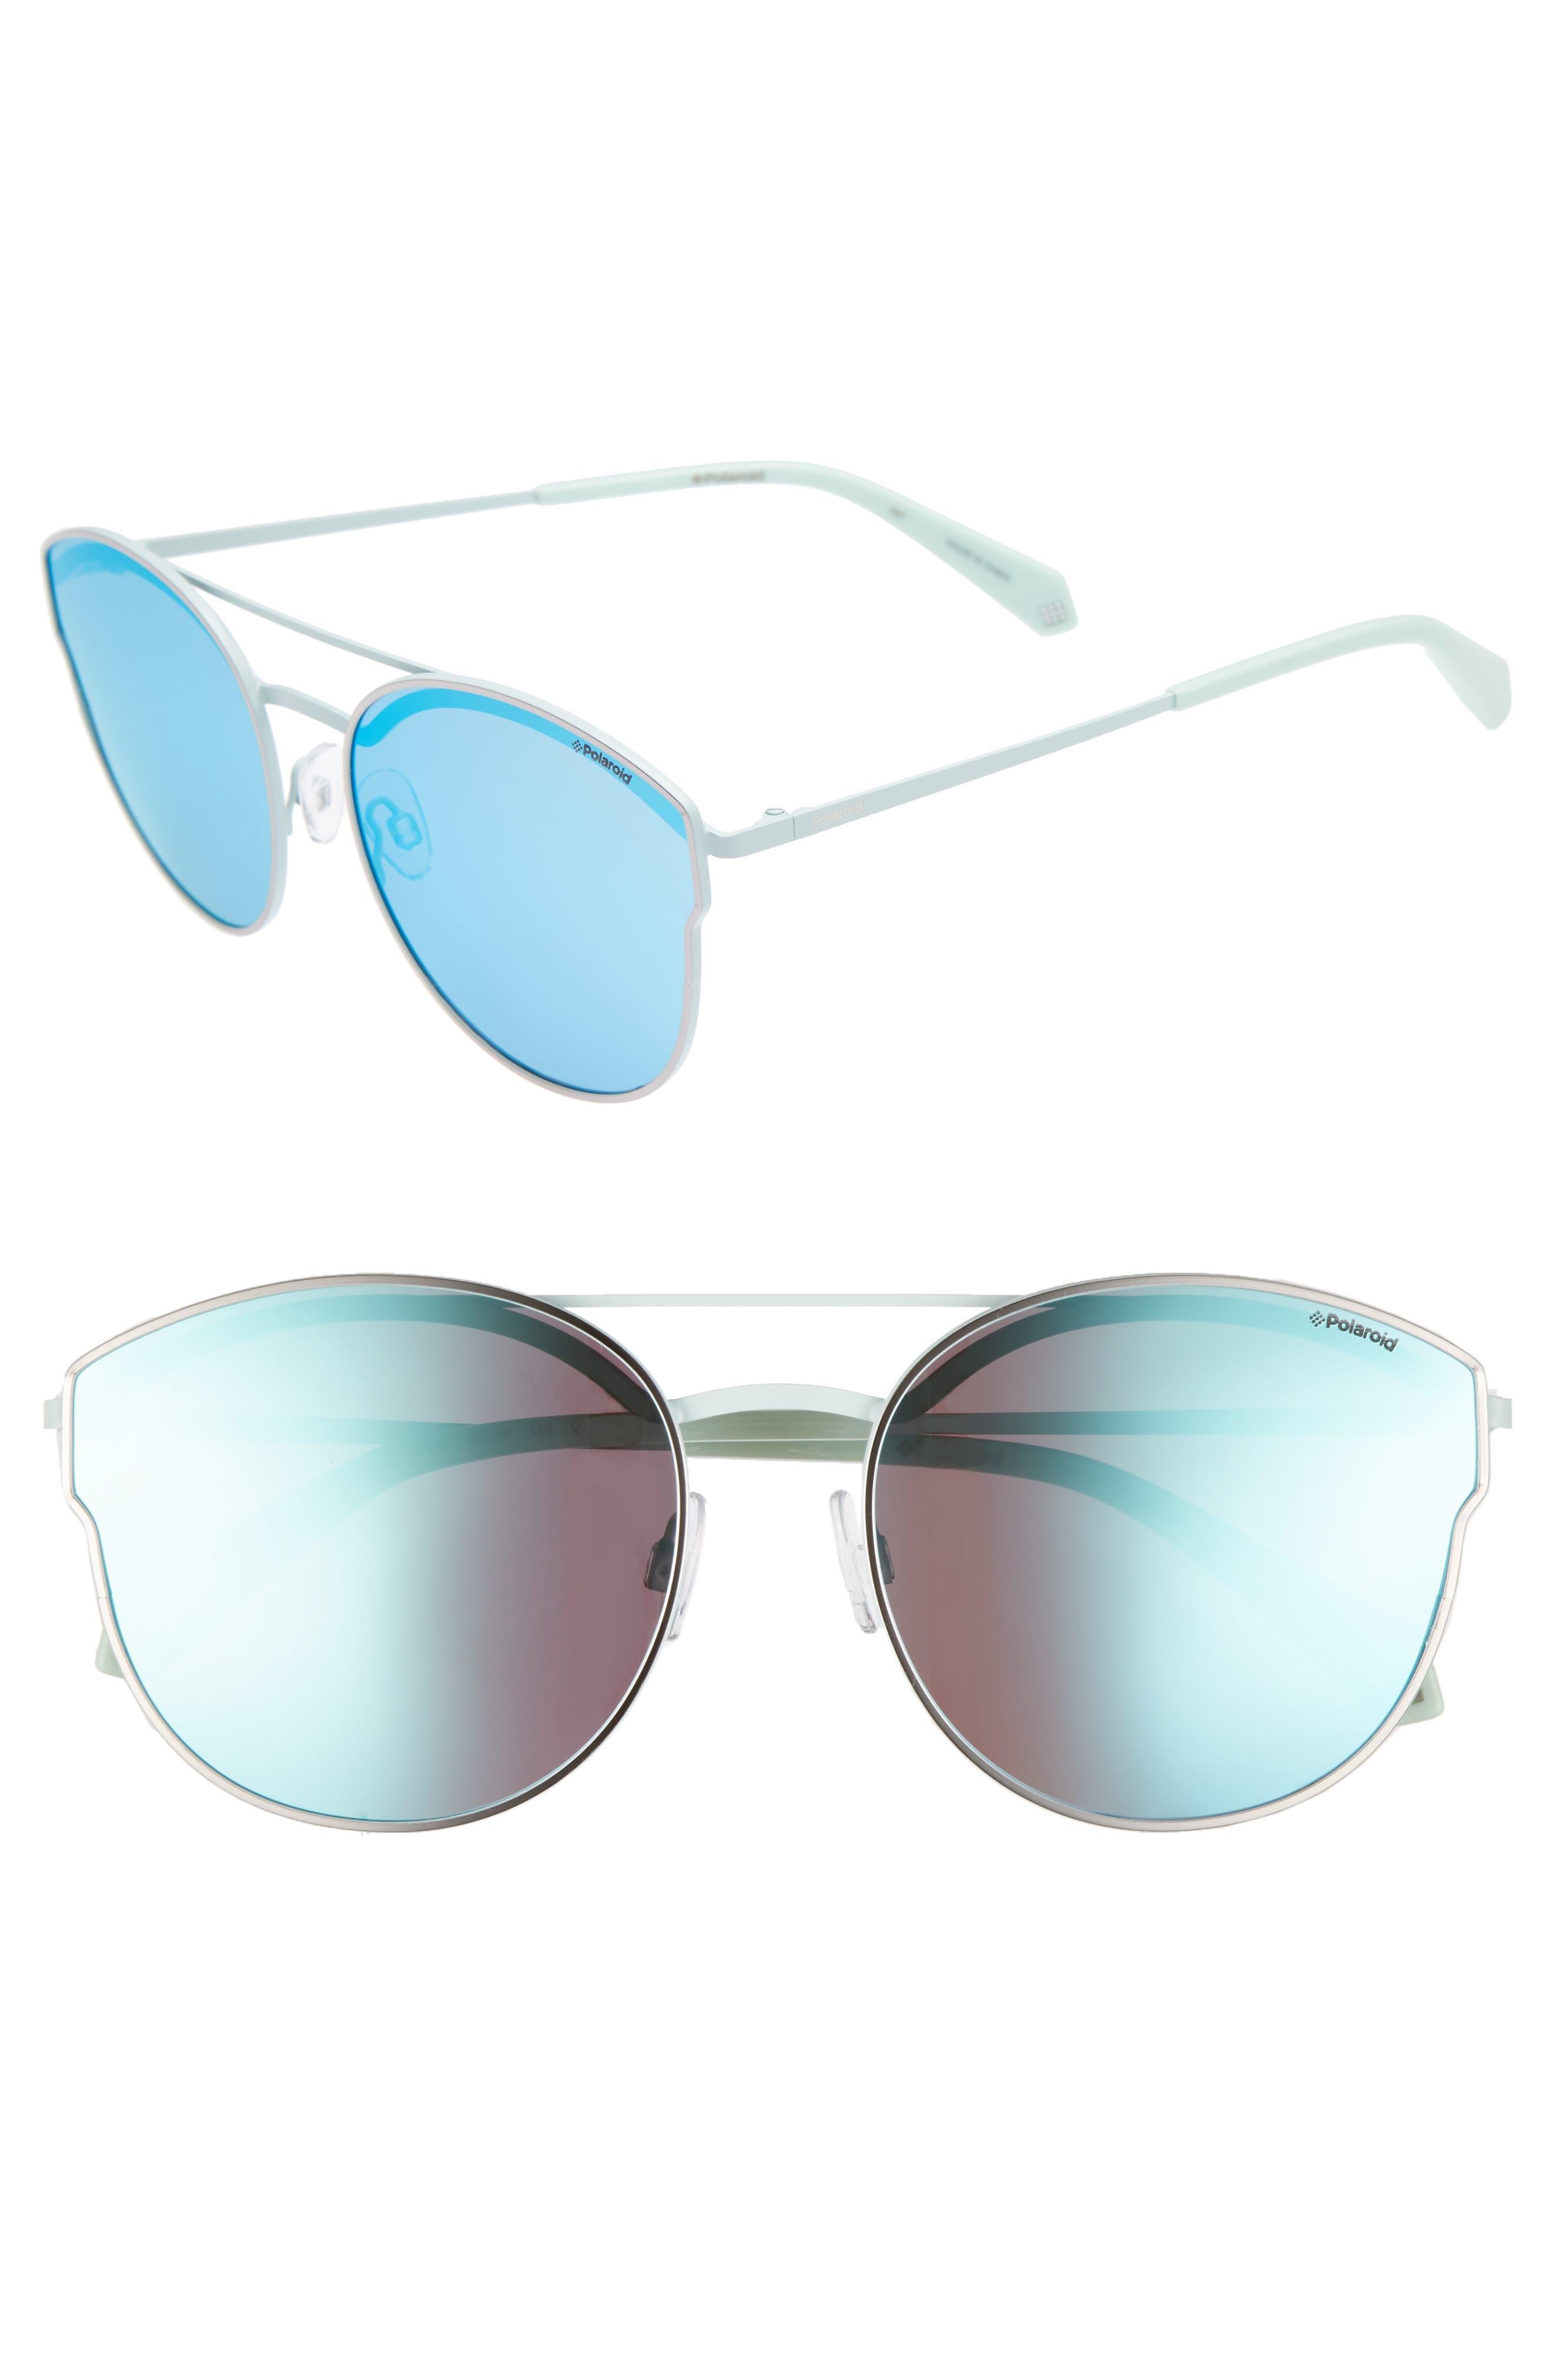 60mm Polarized Round Aviator Sunglasses,                         Main,                         color, Ruthenium